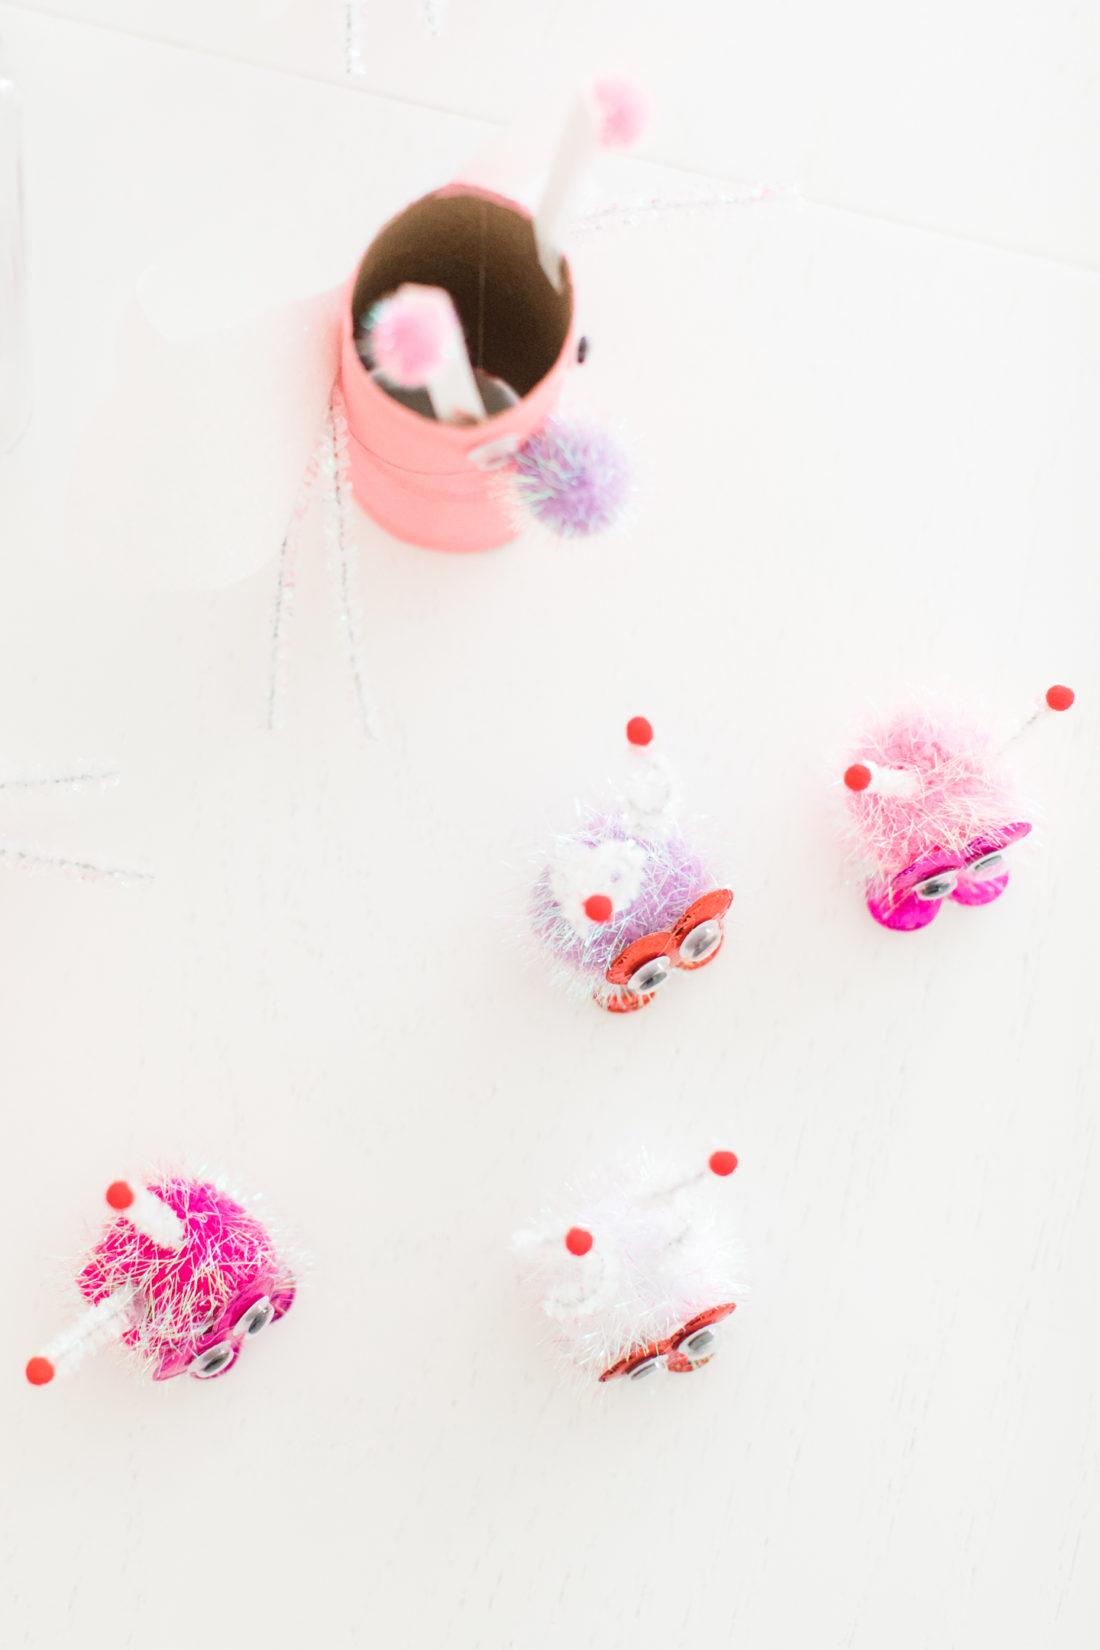 Eva Amurri Martino shares the steps to create adorable DIY lovebugs for Valentine's Day